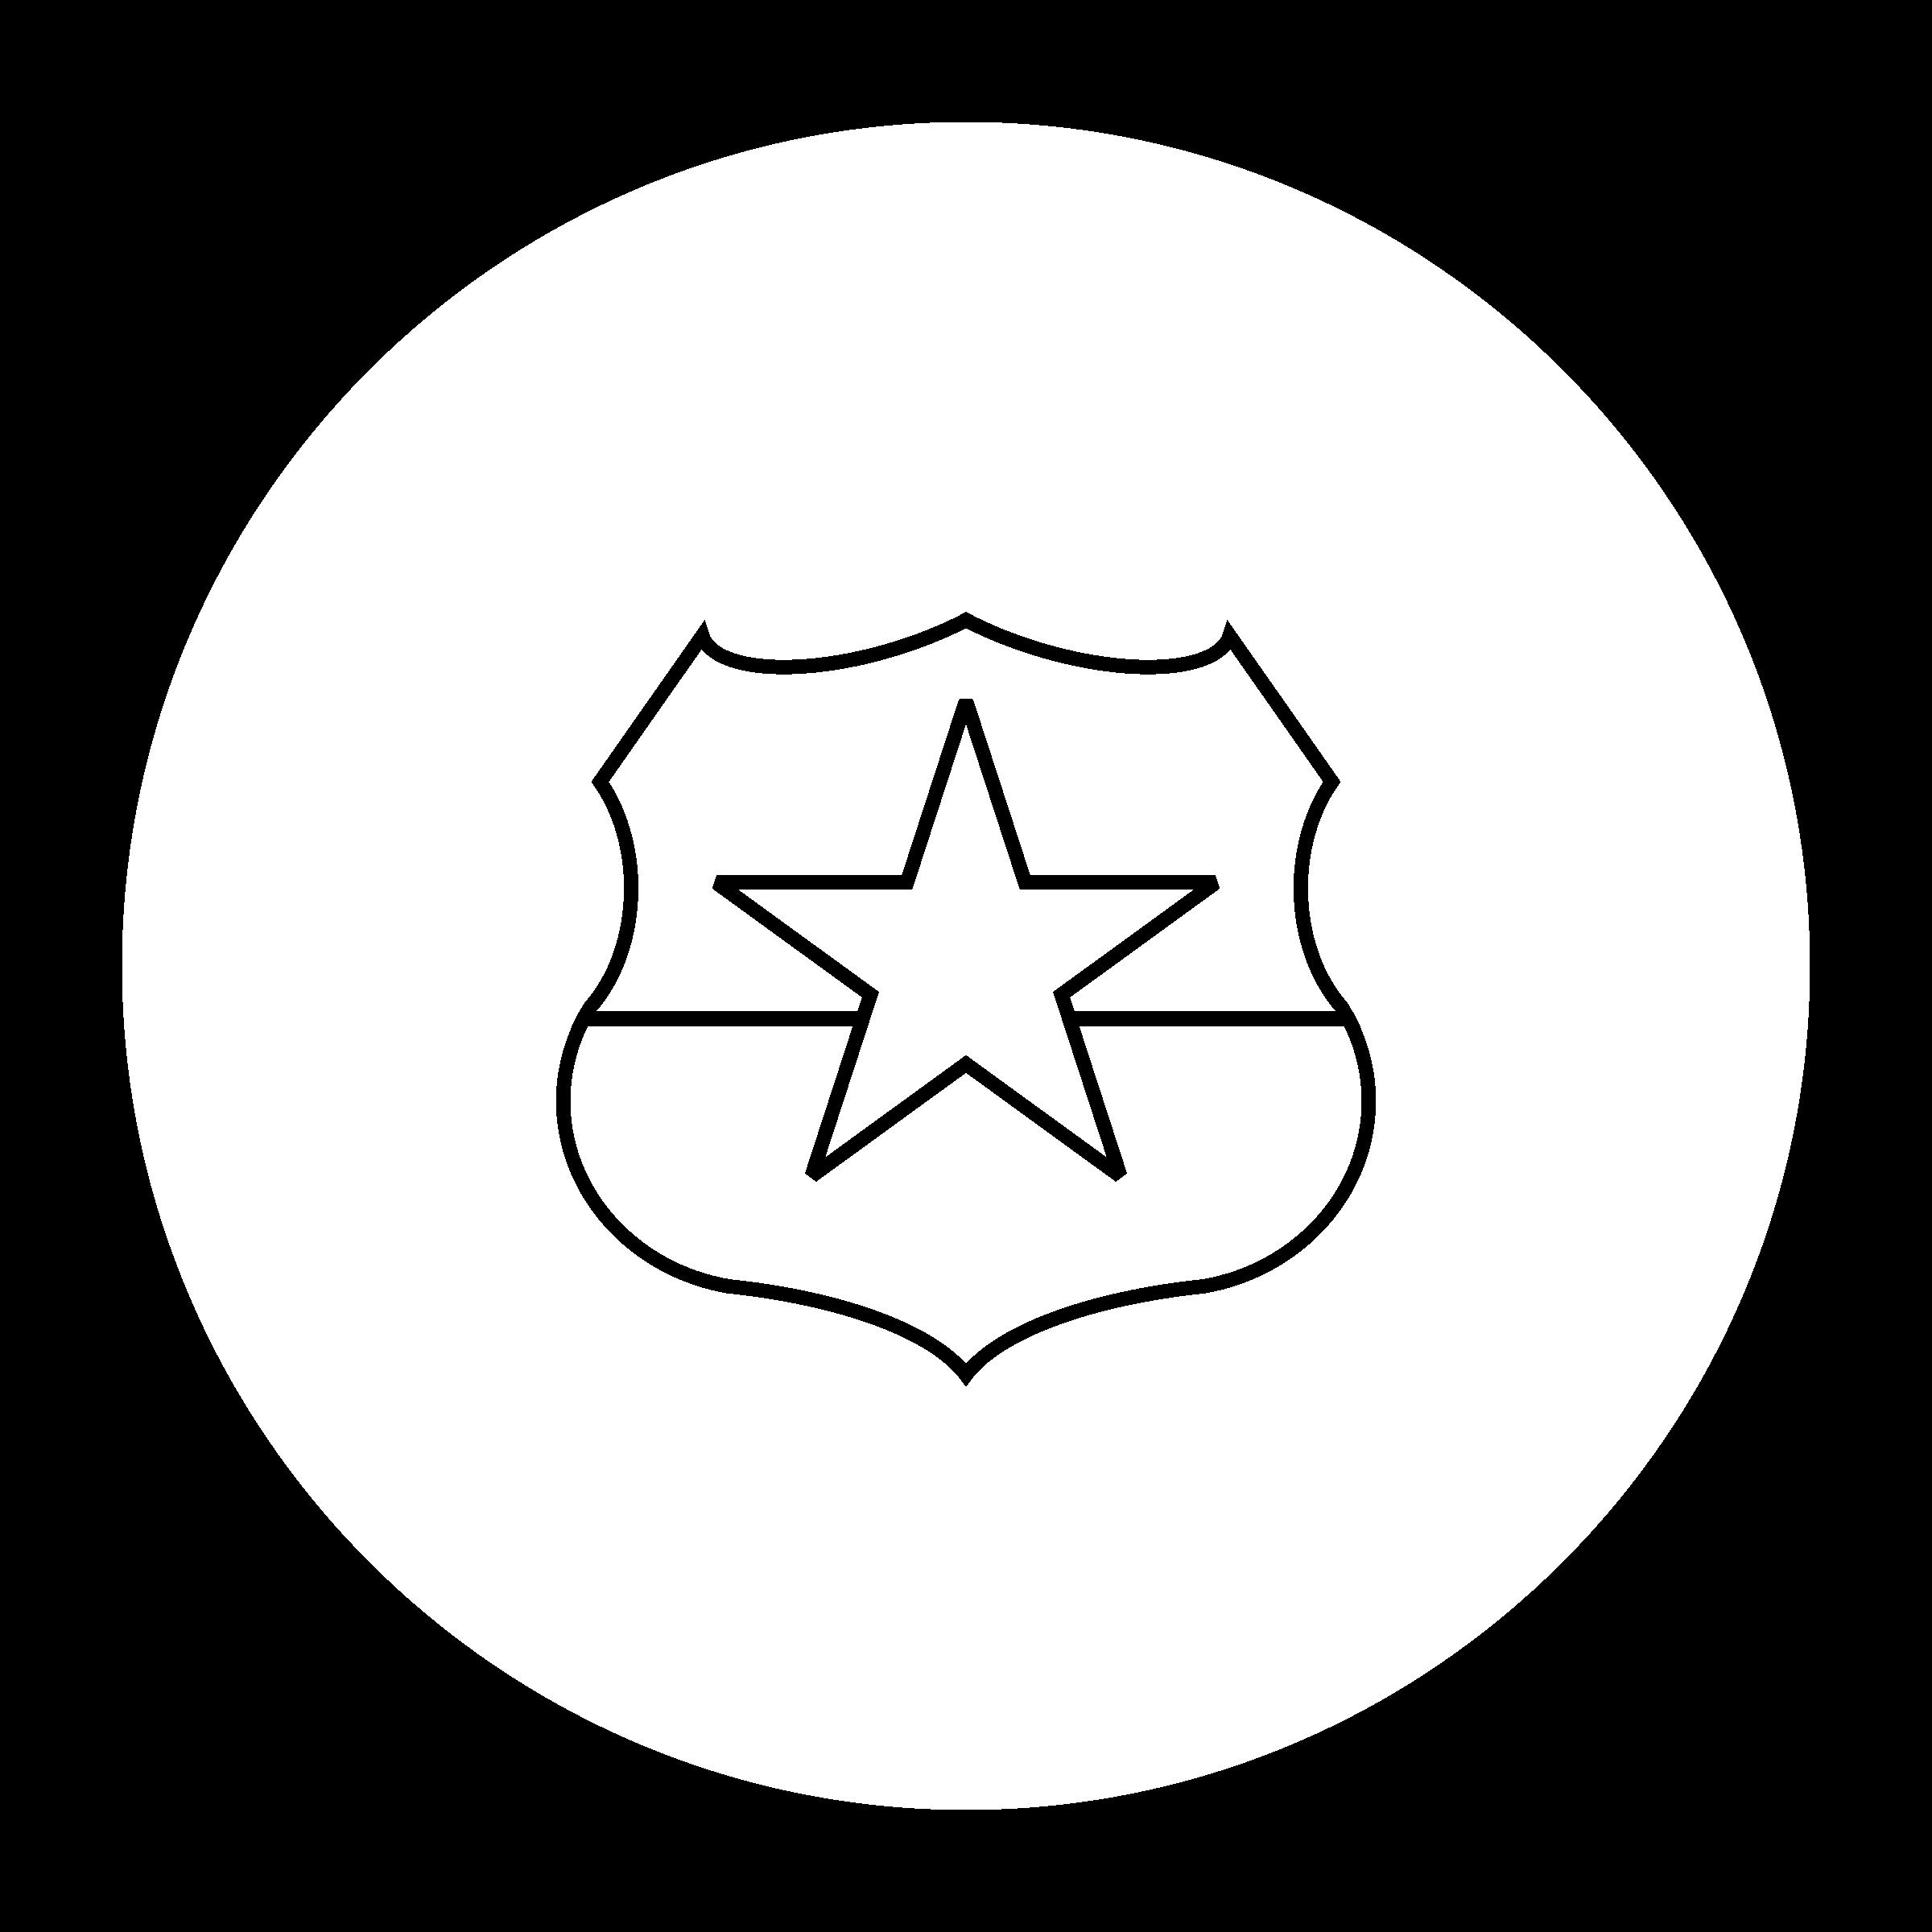 Federacion De Futbol De Chile Logo Png Transparent Svg Vector Freebie Supply